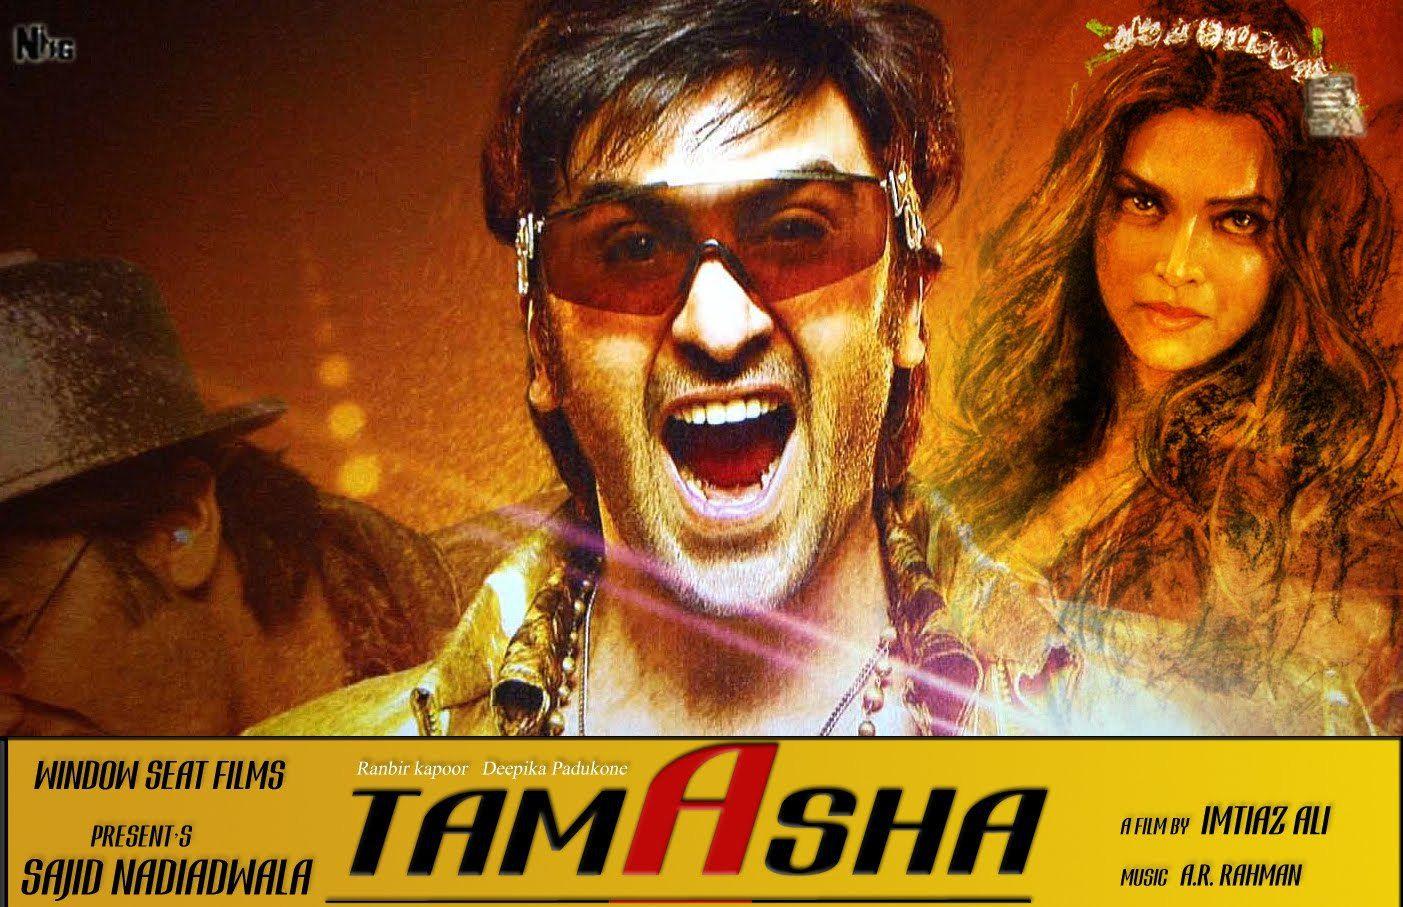 Tamasha Official Trailer - Deepika Padukone and Ranbir ...